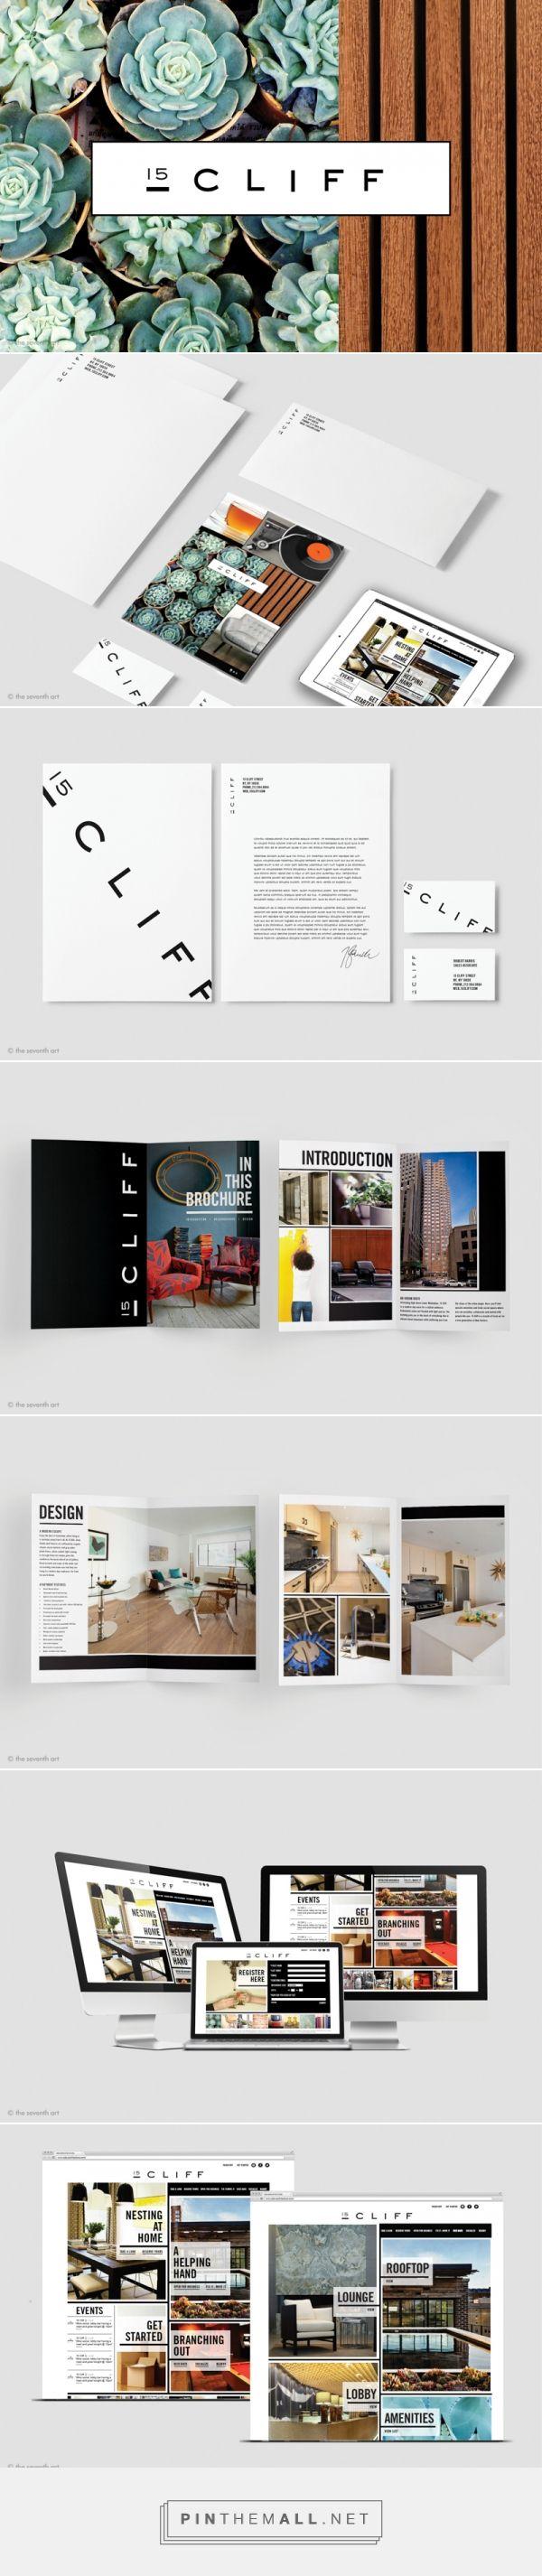 15 Cliff Residential Branding by The Seventh Art LLC | Fivestar Branding – Design and Branding Agency & Inspiration Gallery